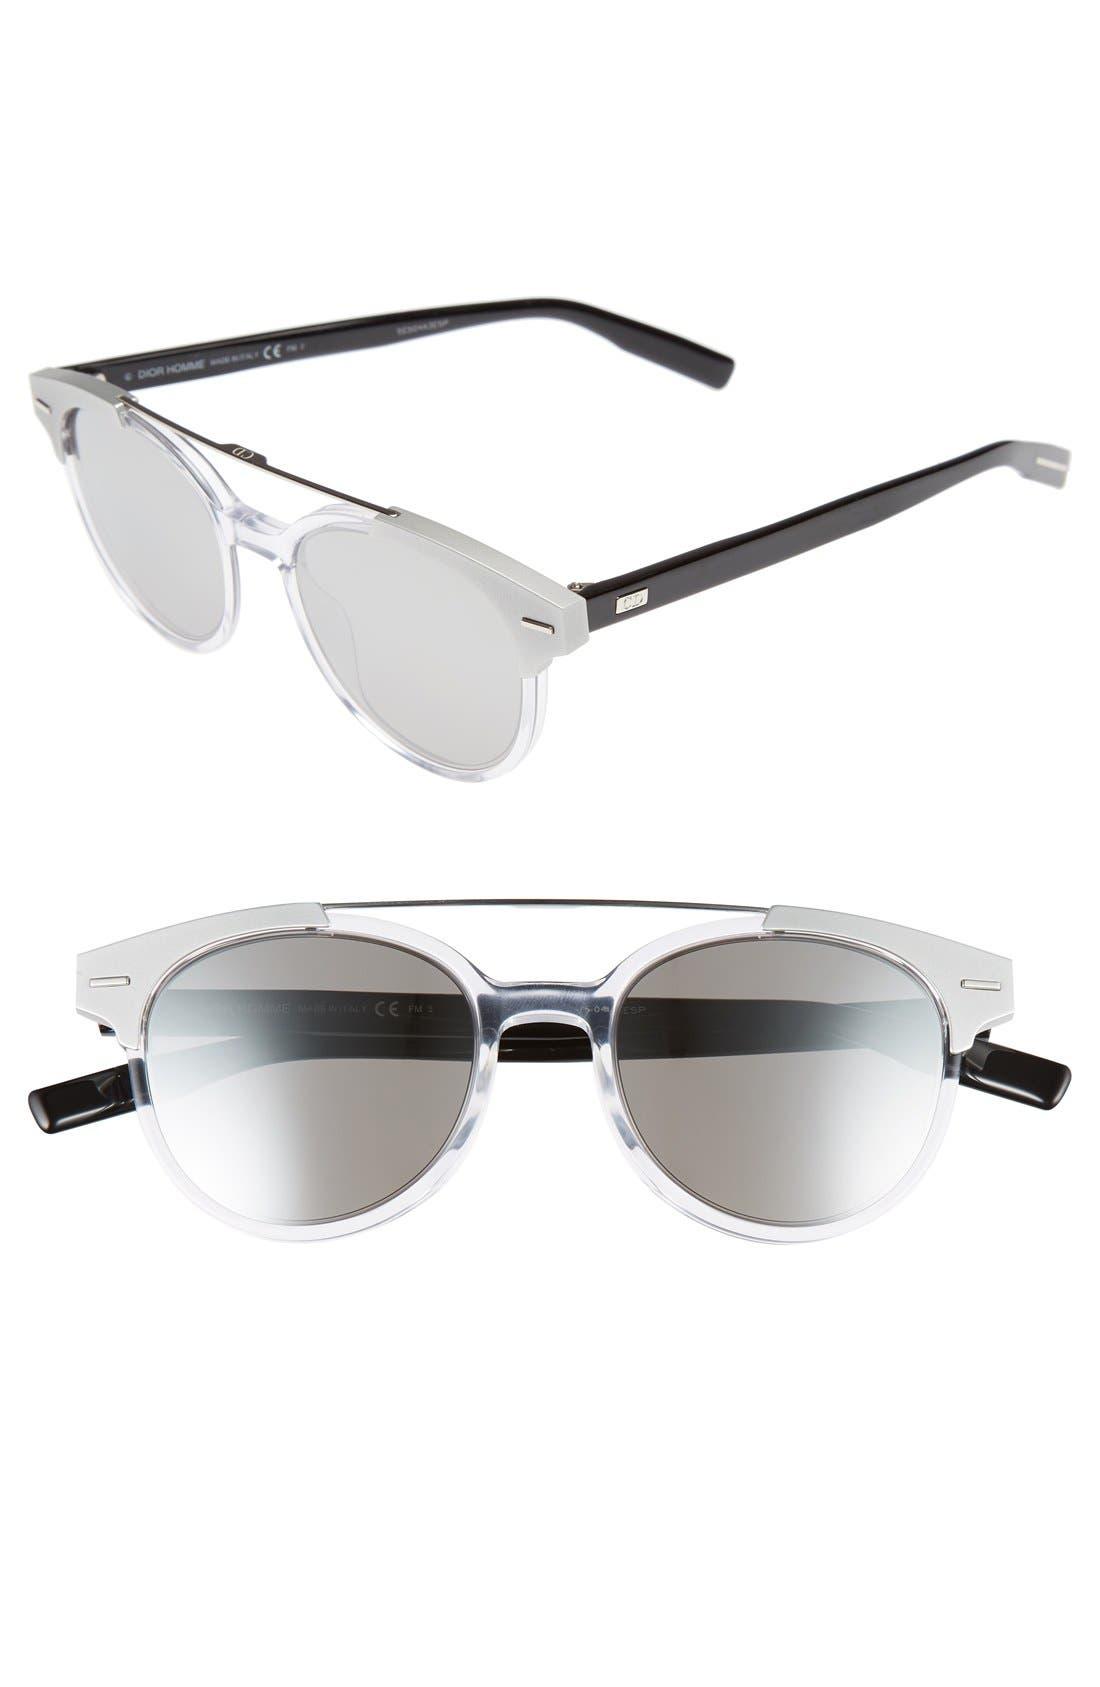 Main Image - Dior 'Black Tie' 51mm Sunglasses